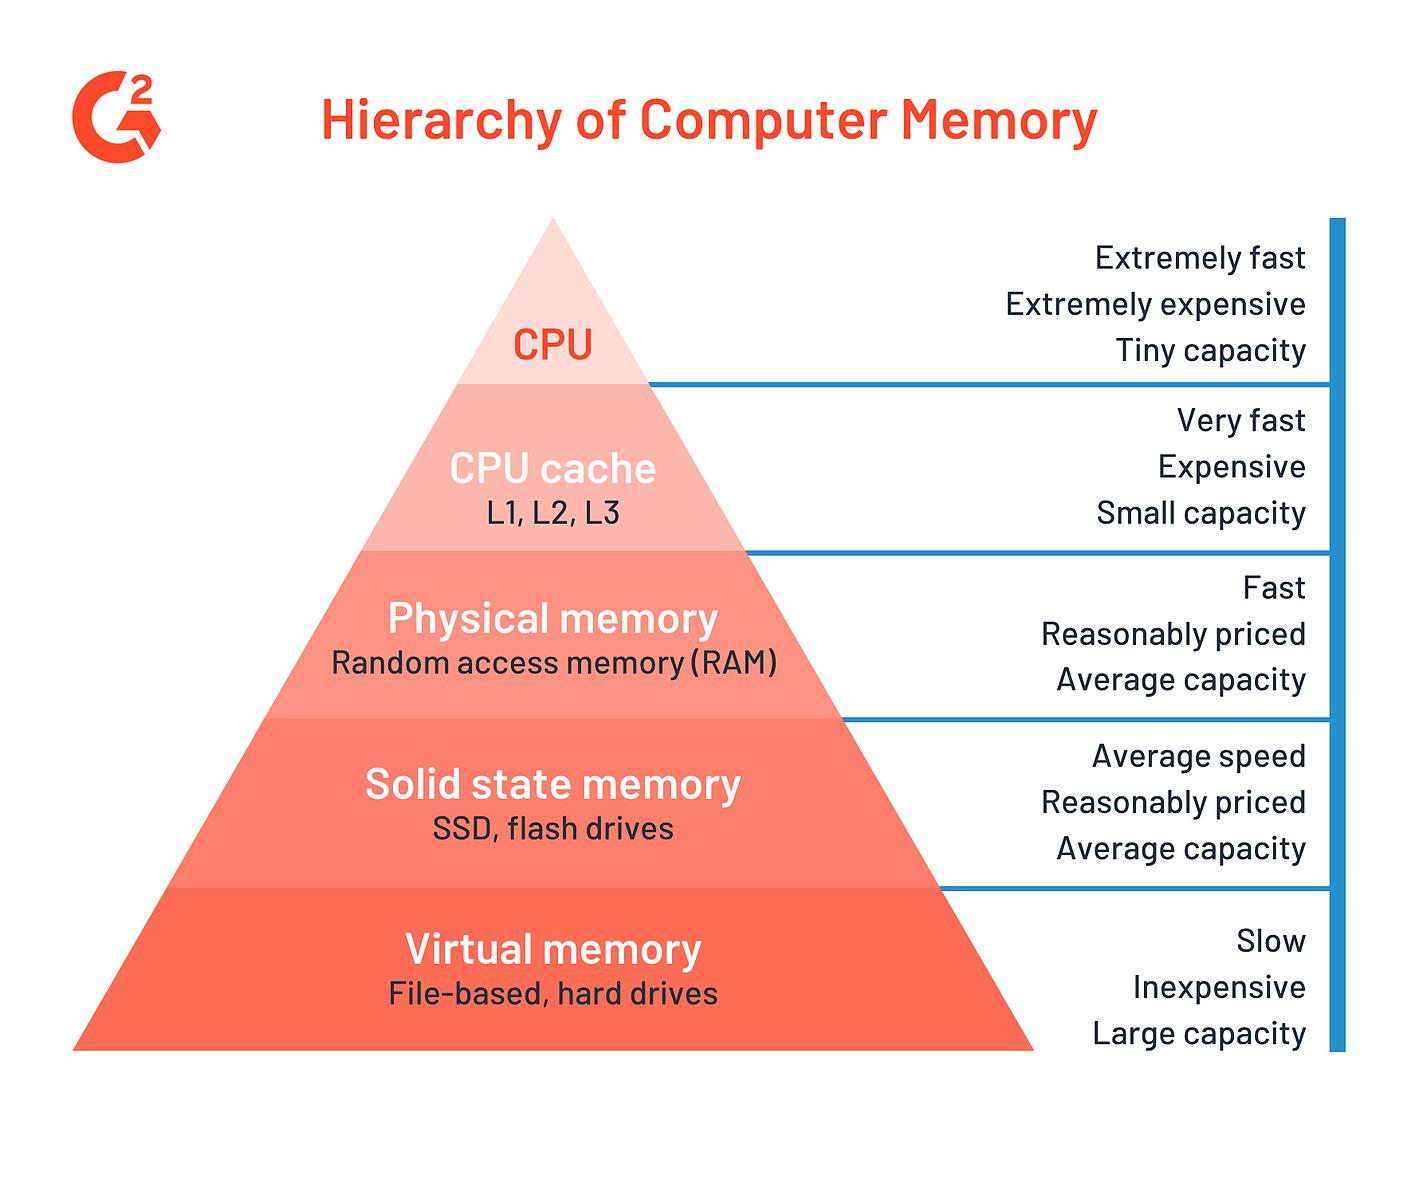 hierarchy of computer memory - scheme